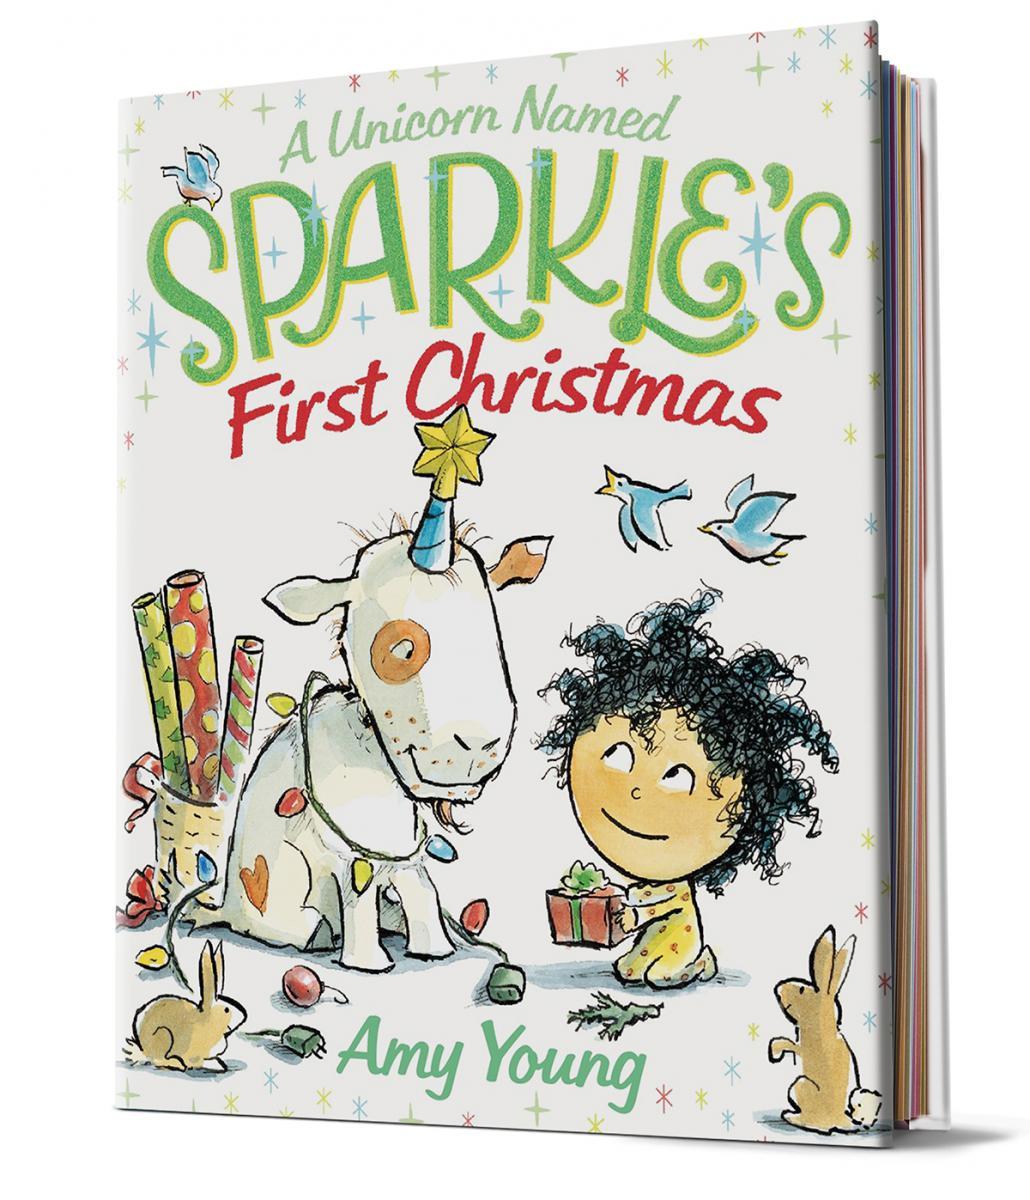 A Unicorn Named Sparkle's First Christmas